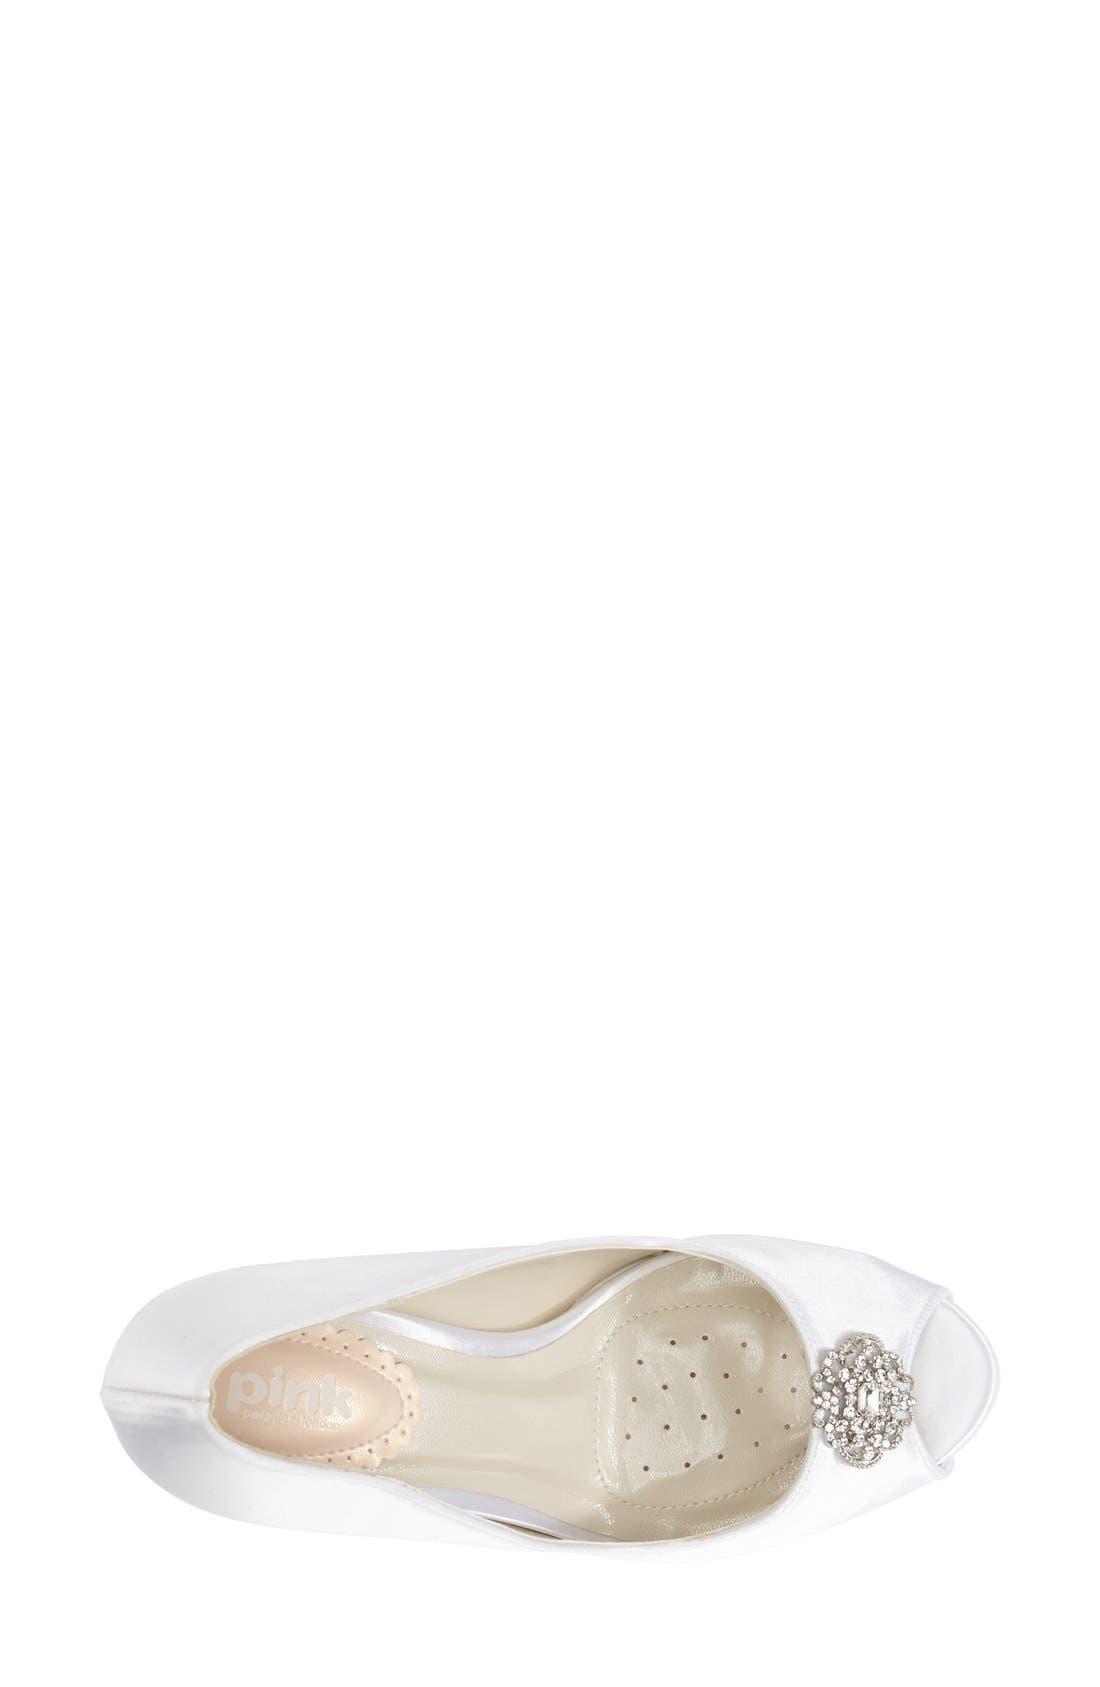 Alternate Image 3  - pink paradox london 'Lustre' Crystal Embellished Peep Toe Pump (Women)